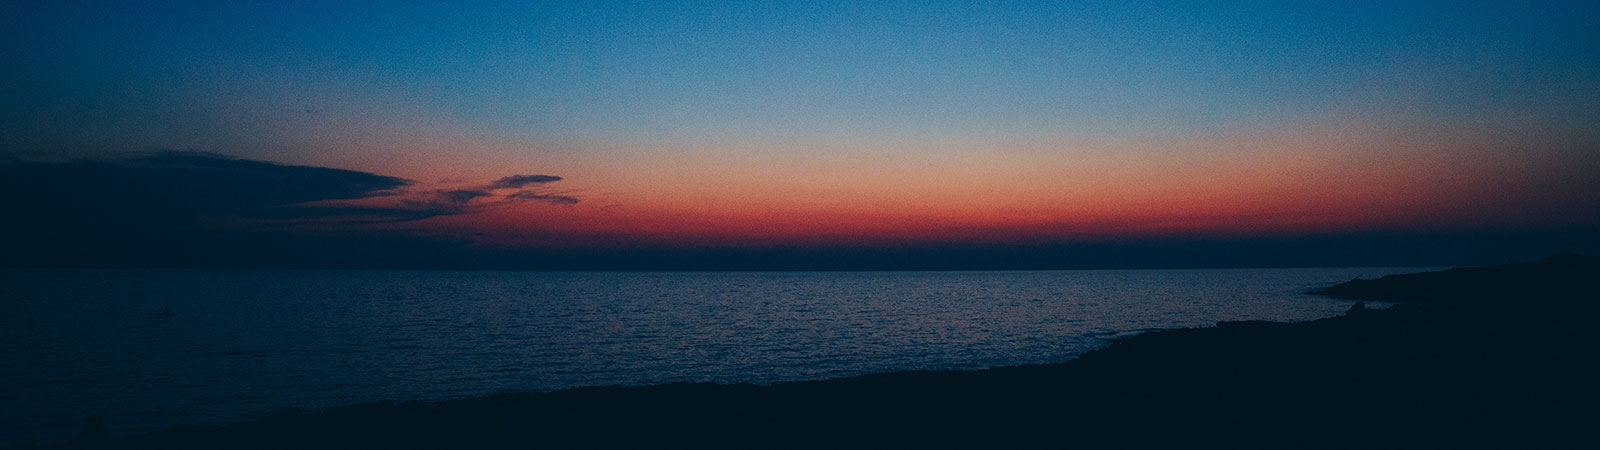 salento-gallipoli-b4-sunset-welcome-party